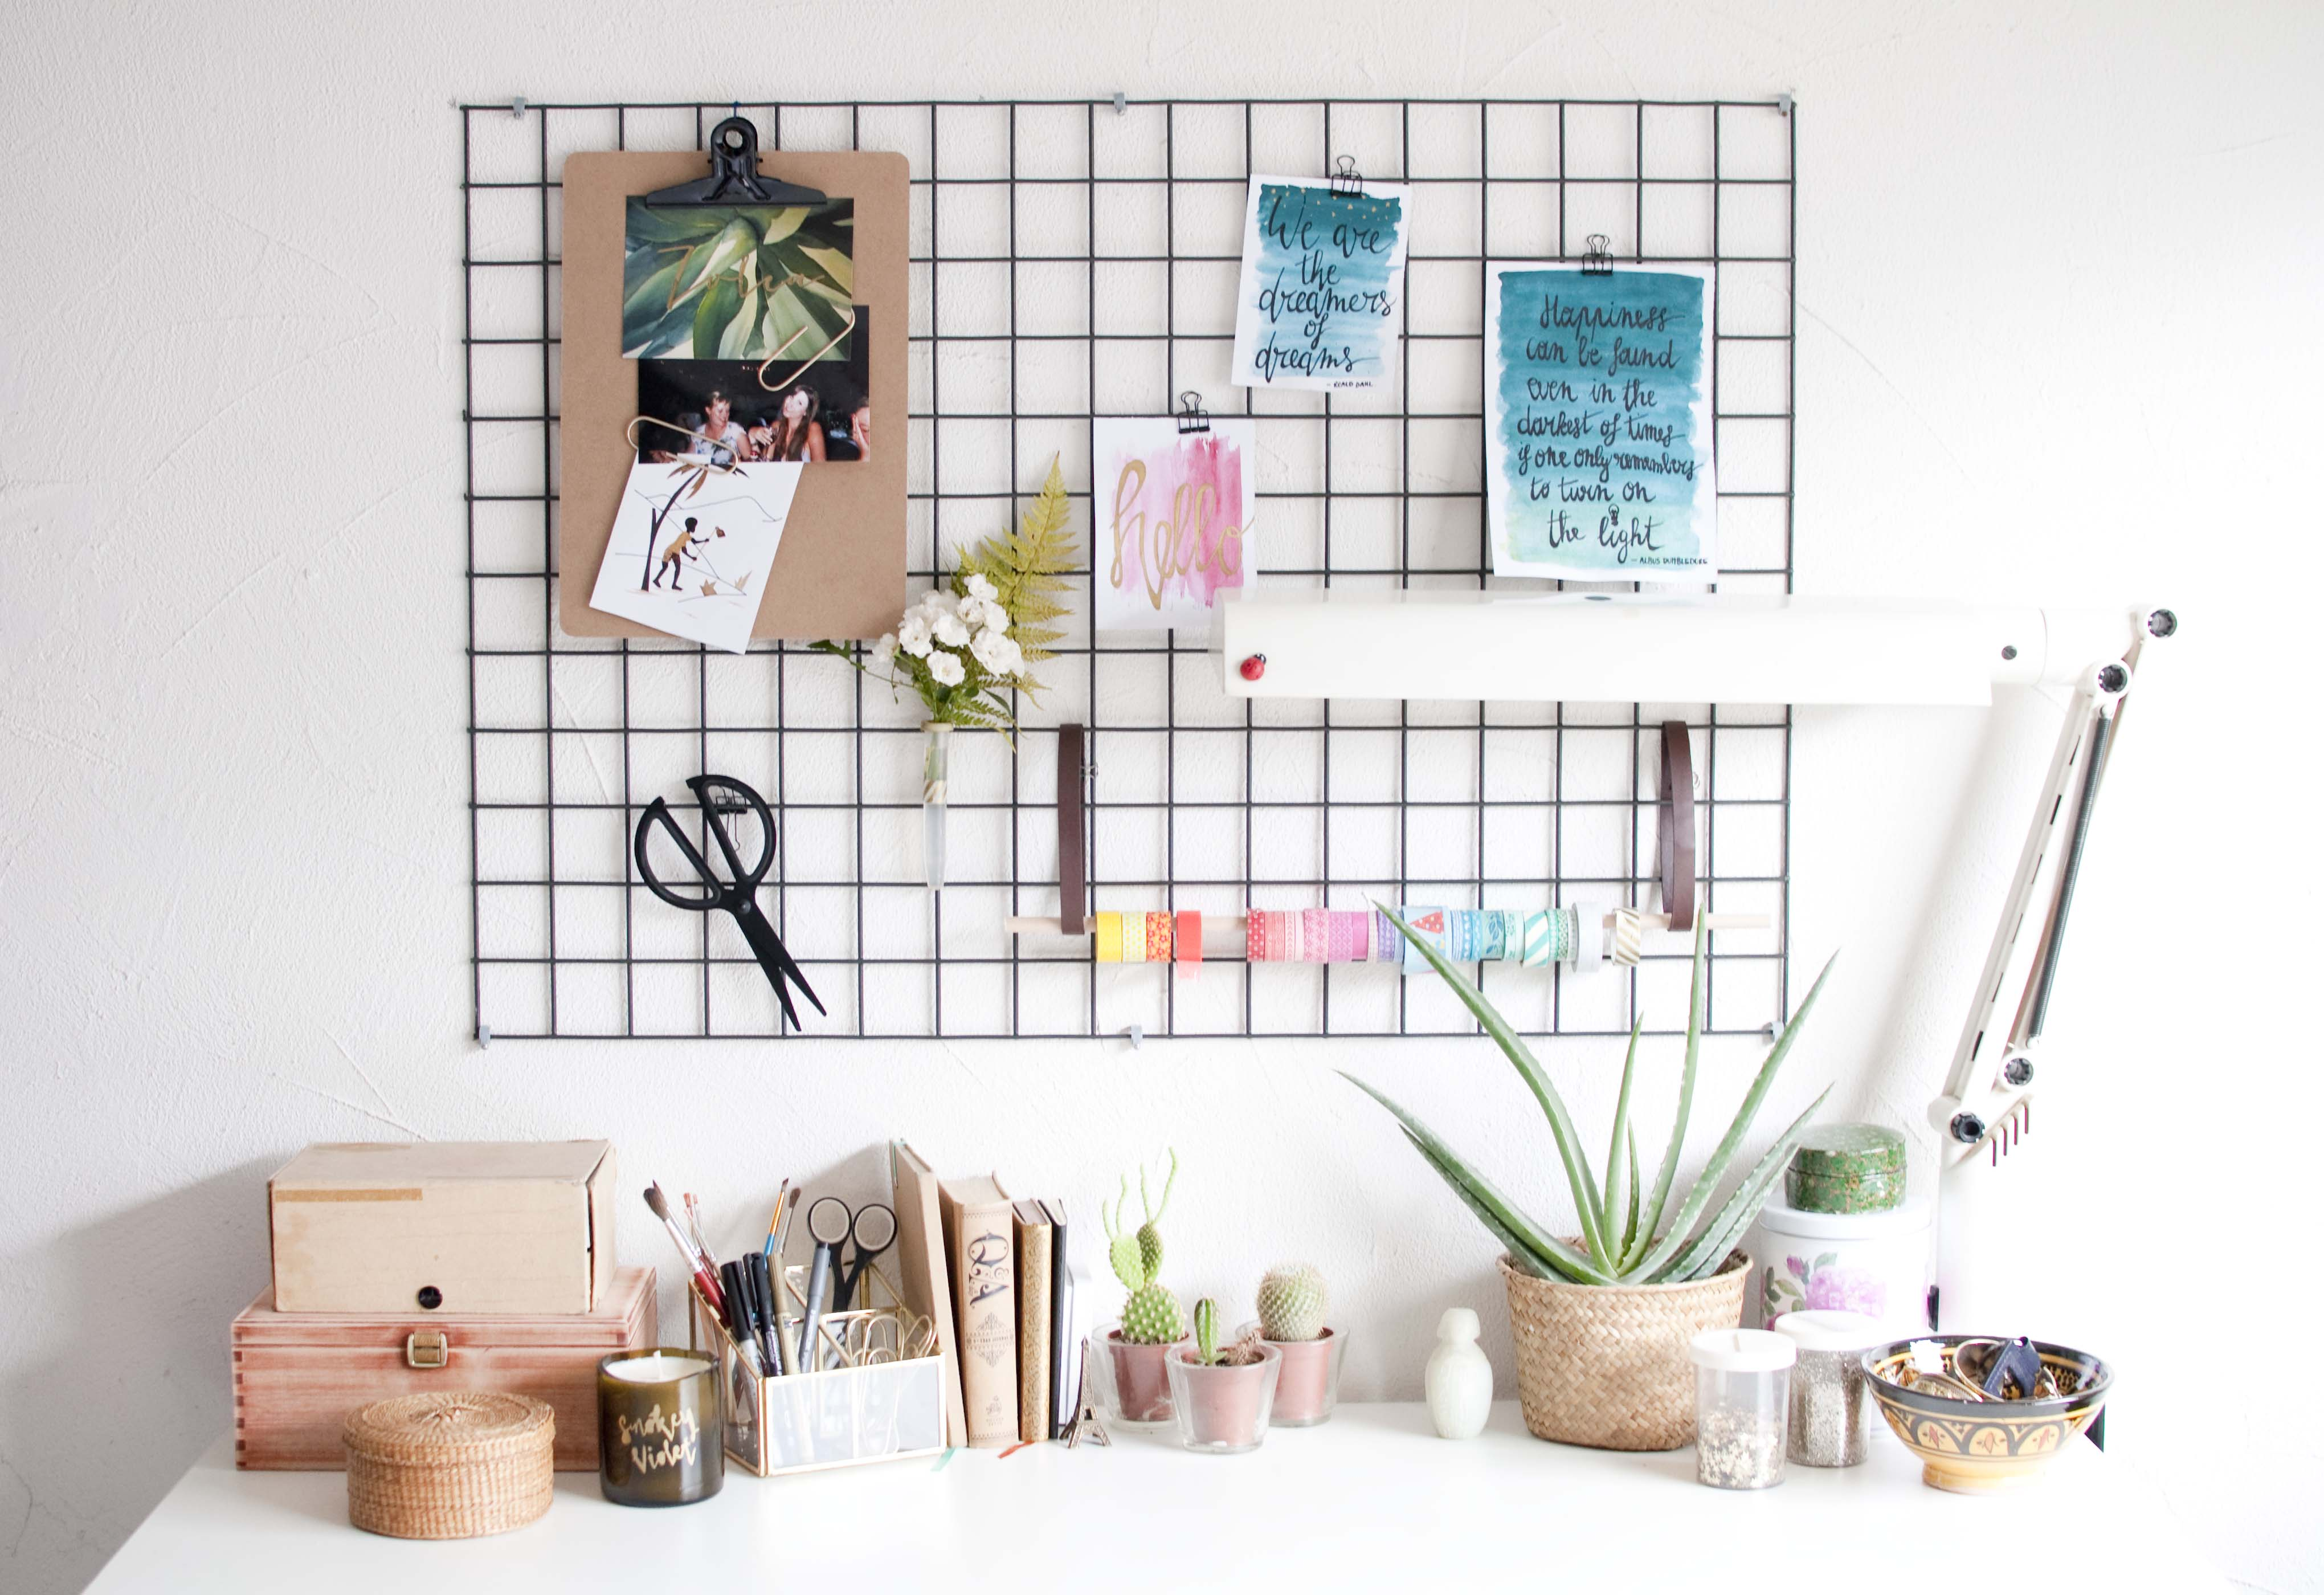 diy wall grid organisation